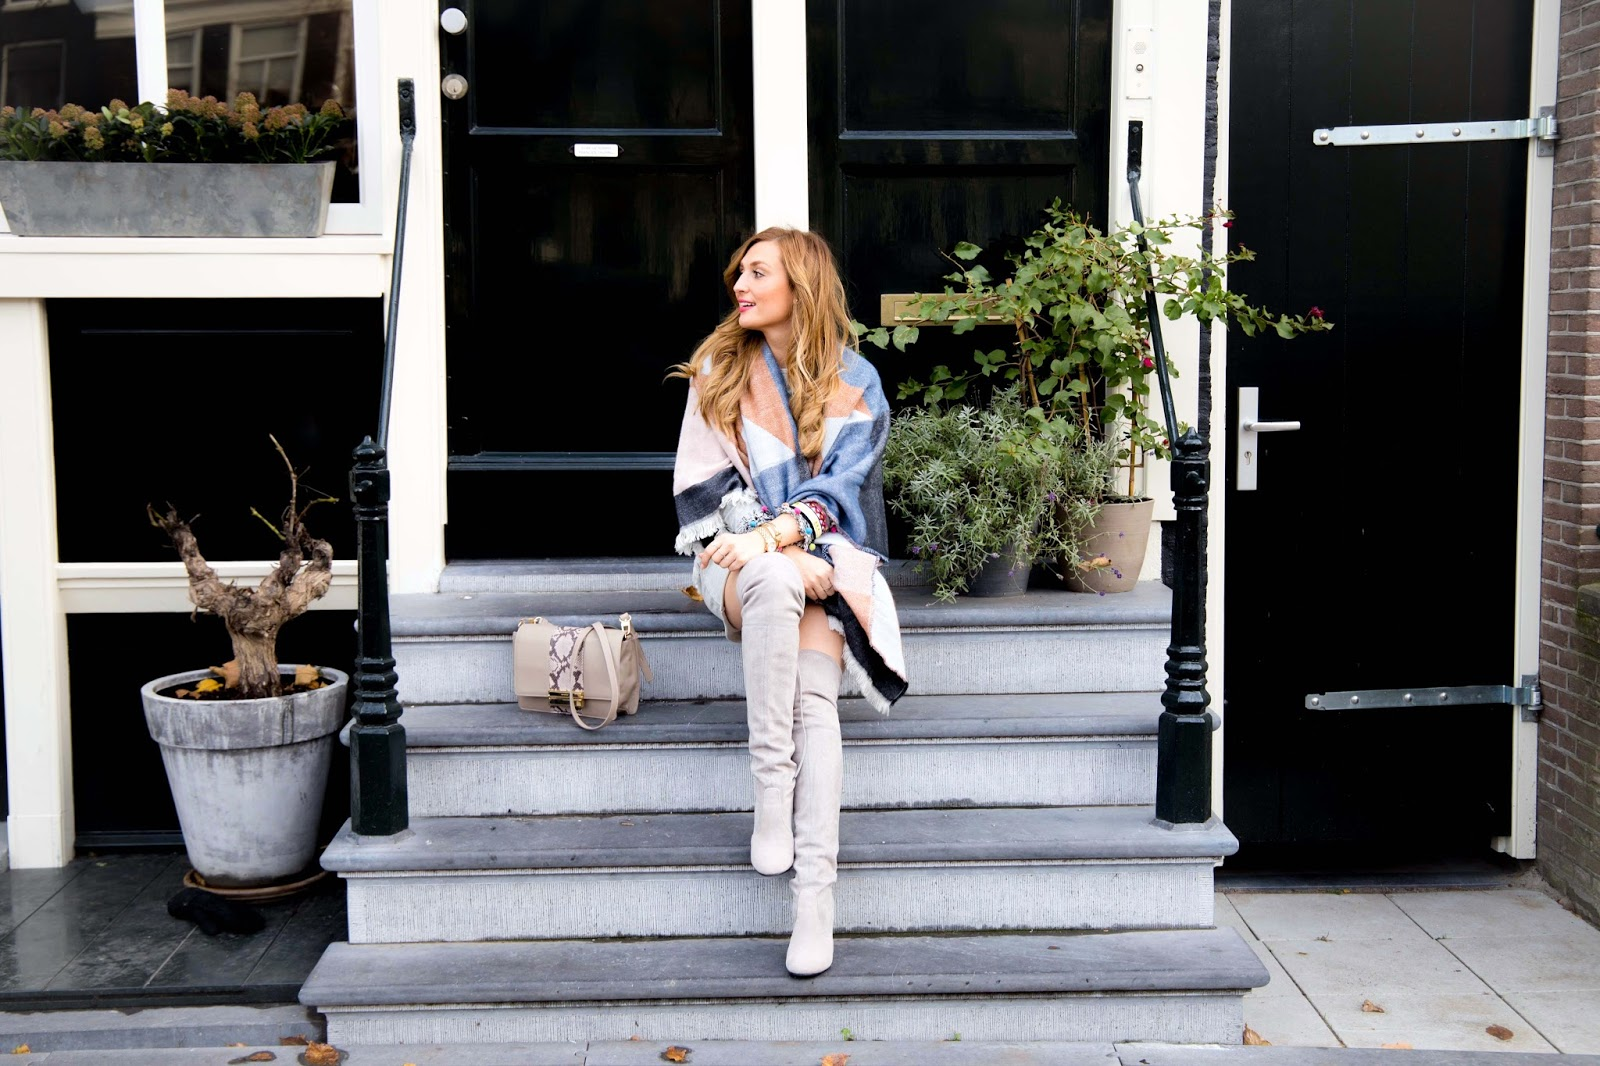 Amsterdam-Loreal-fashionblogger-beautyblogger-blogger-aus-deutschland-fashionstylebyjohanna-sheinside-shein